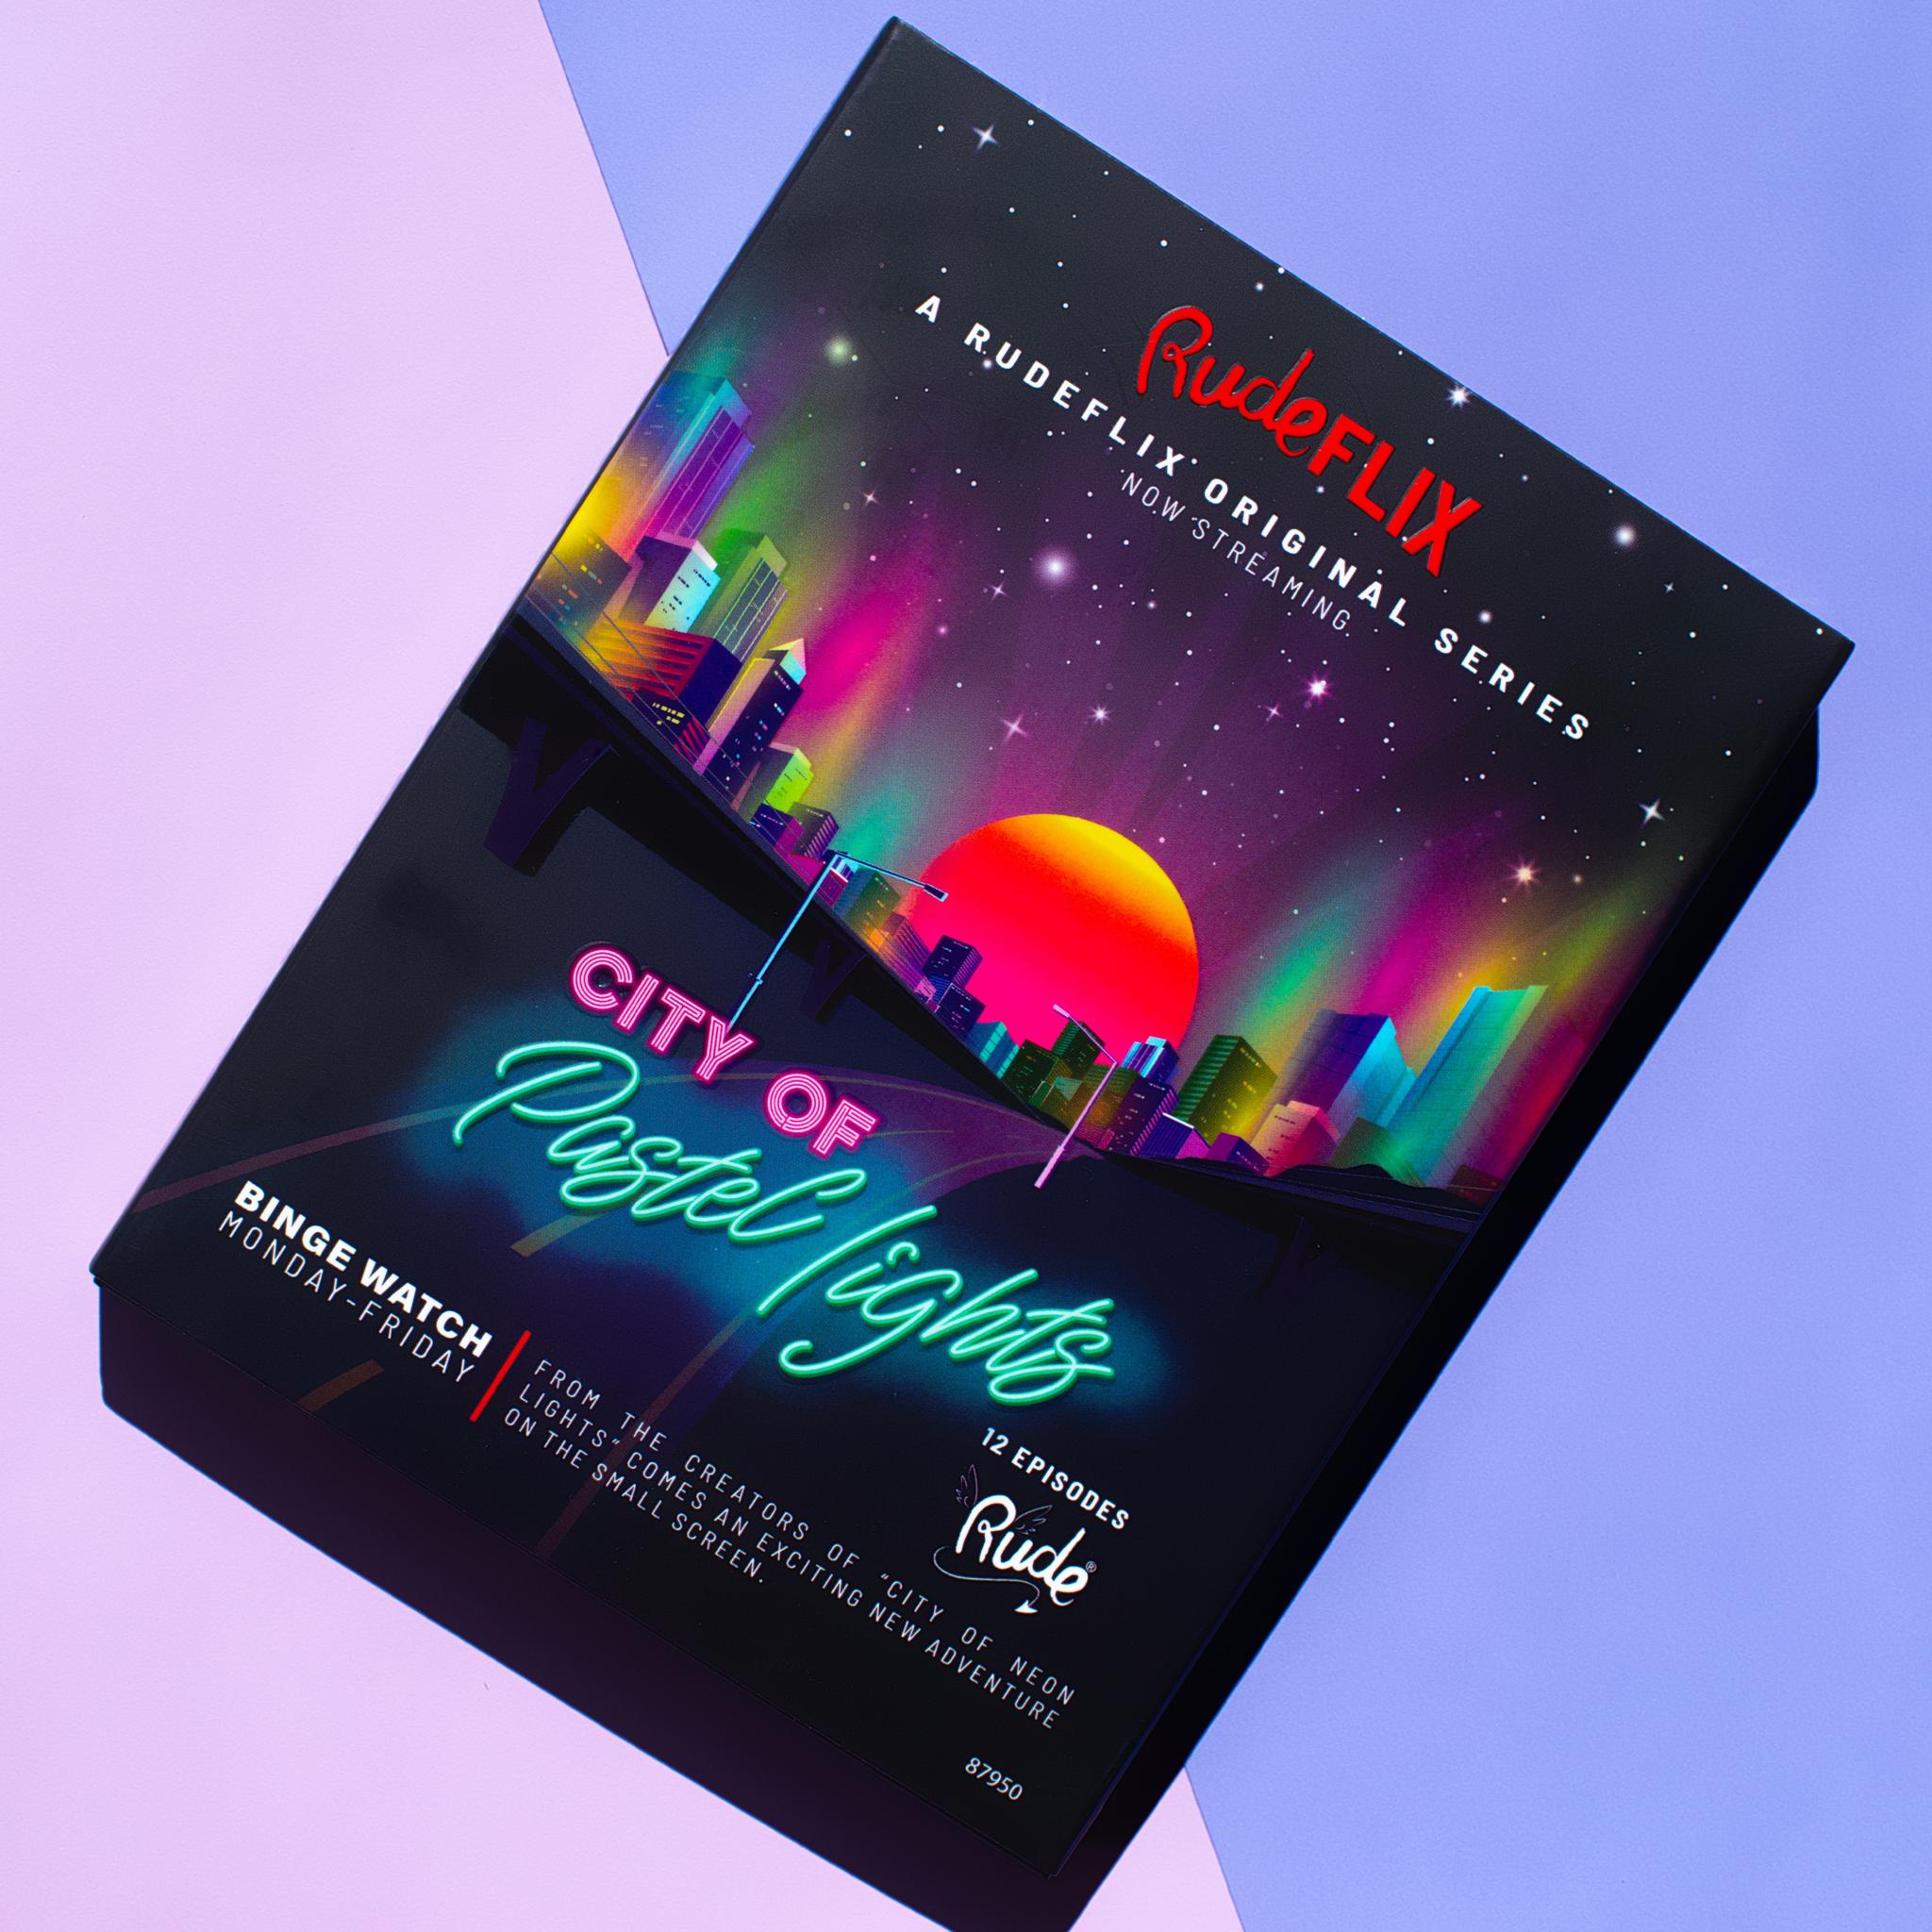 Палетка теней City of Pastel Lights